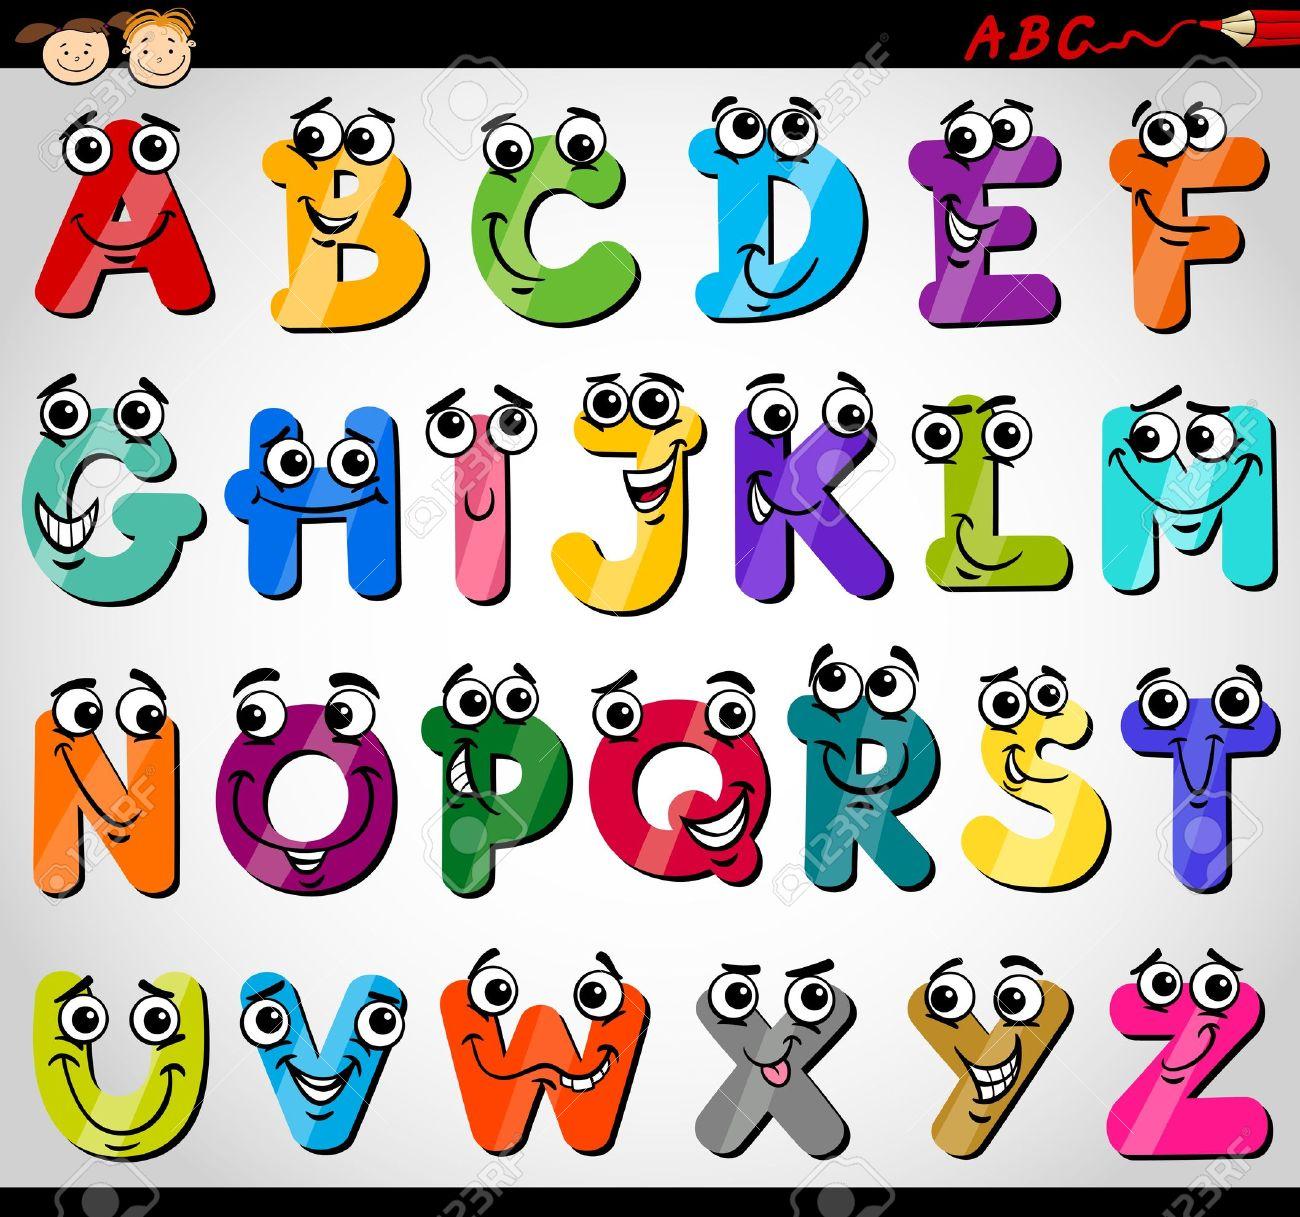 Cartoon Illustration of Funny Capital Letters Alphabet for Children Education - 21590732